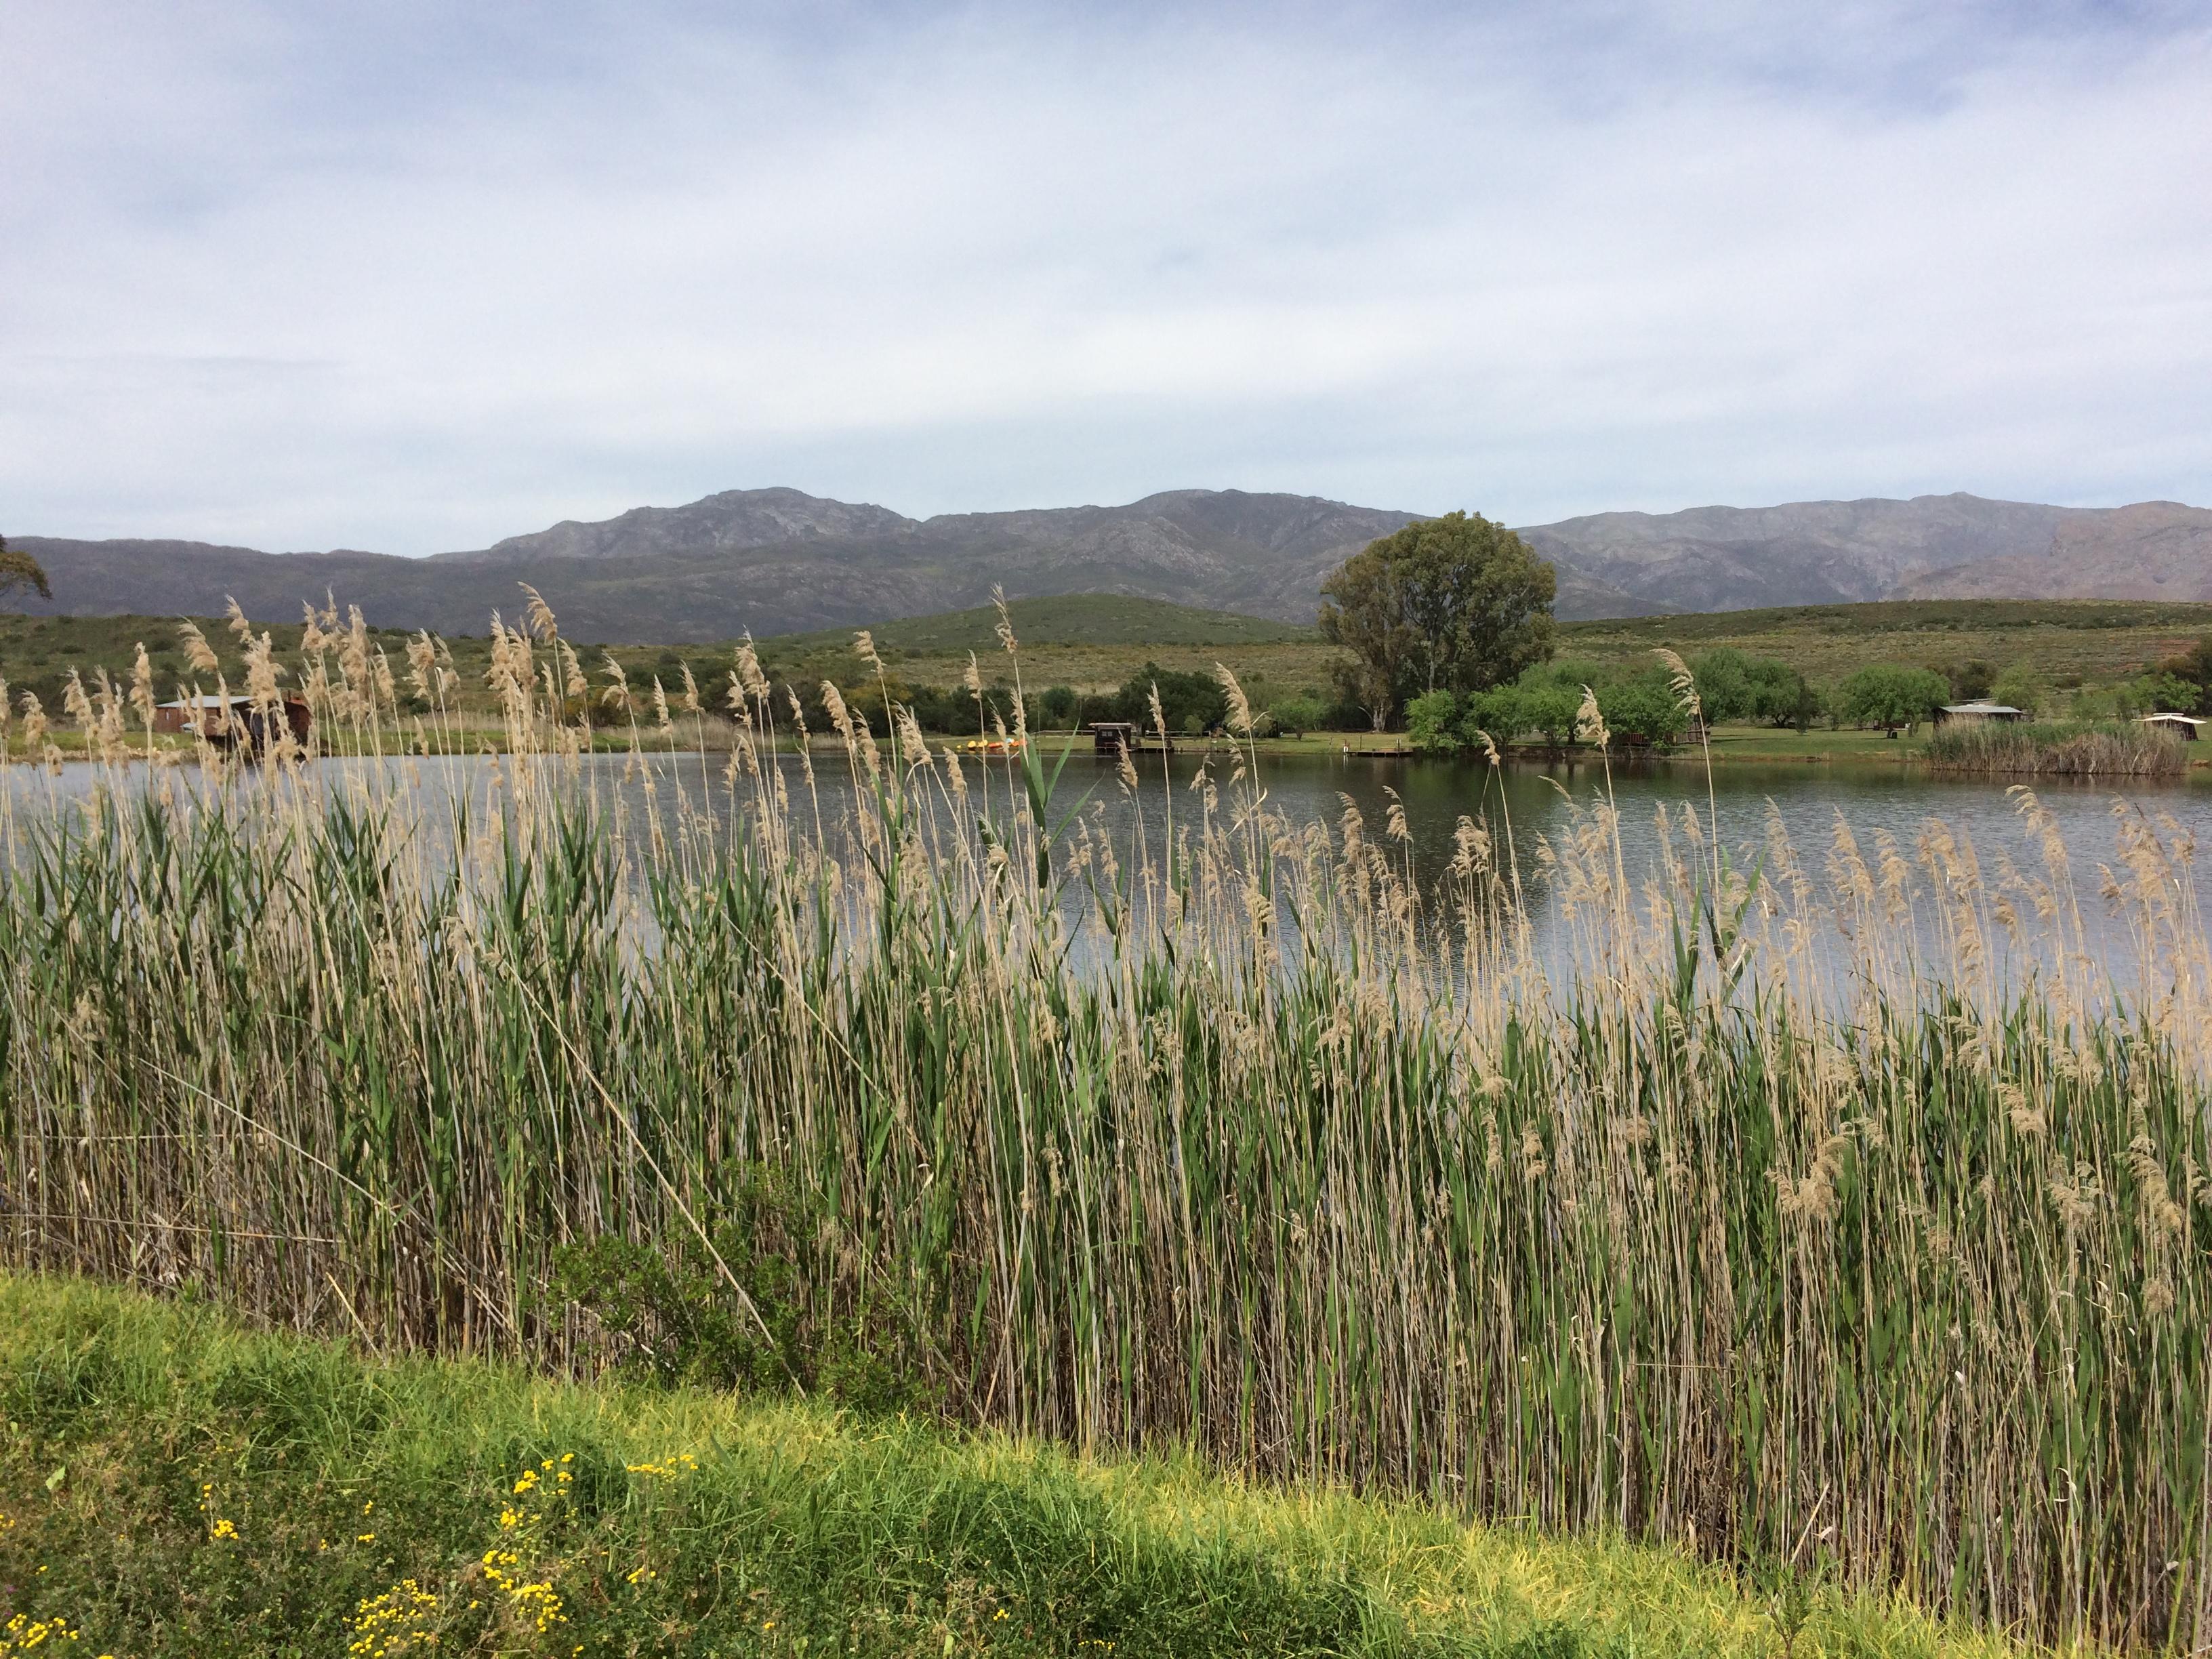 Nigh Sky Caravan Farm - Reeds